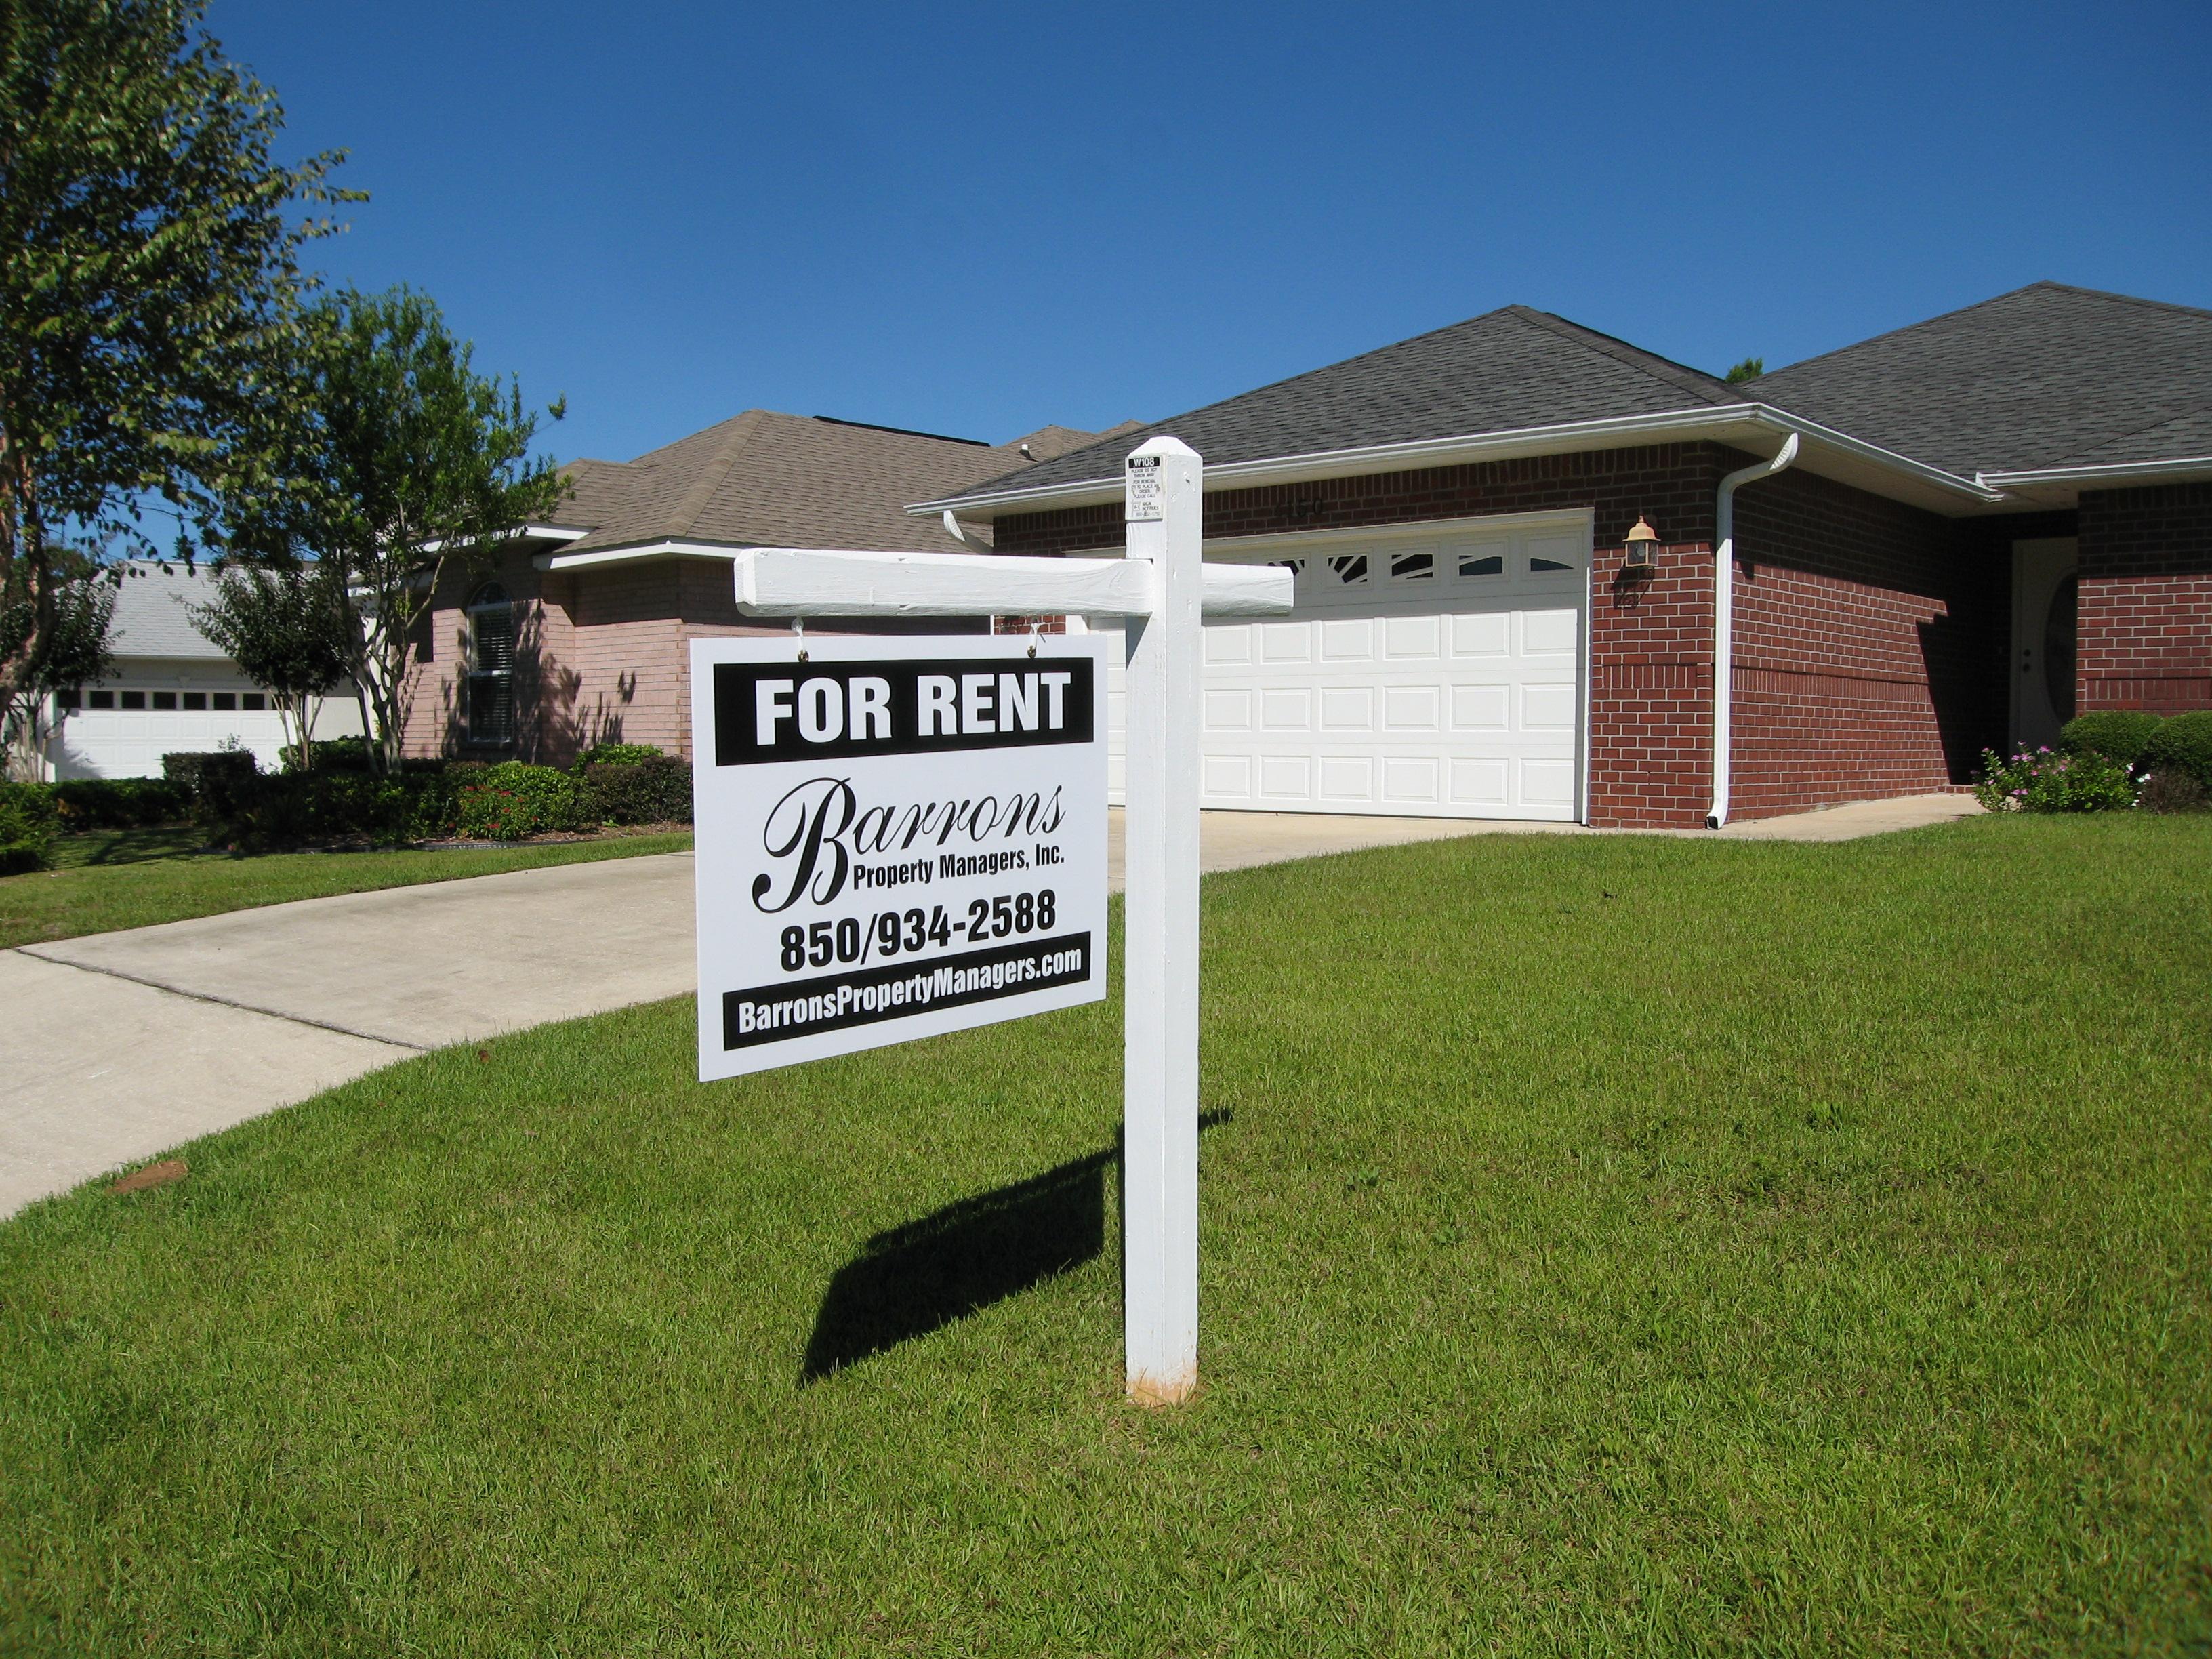 Barrons Property Management